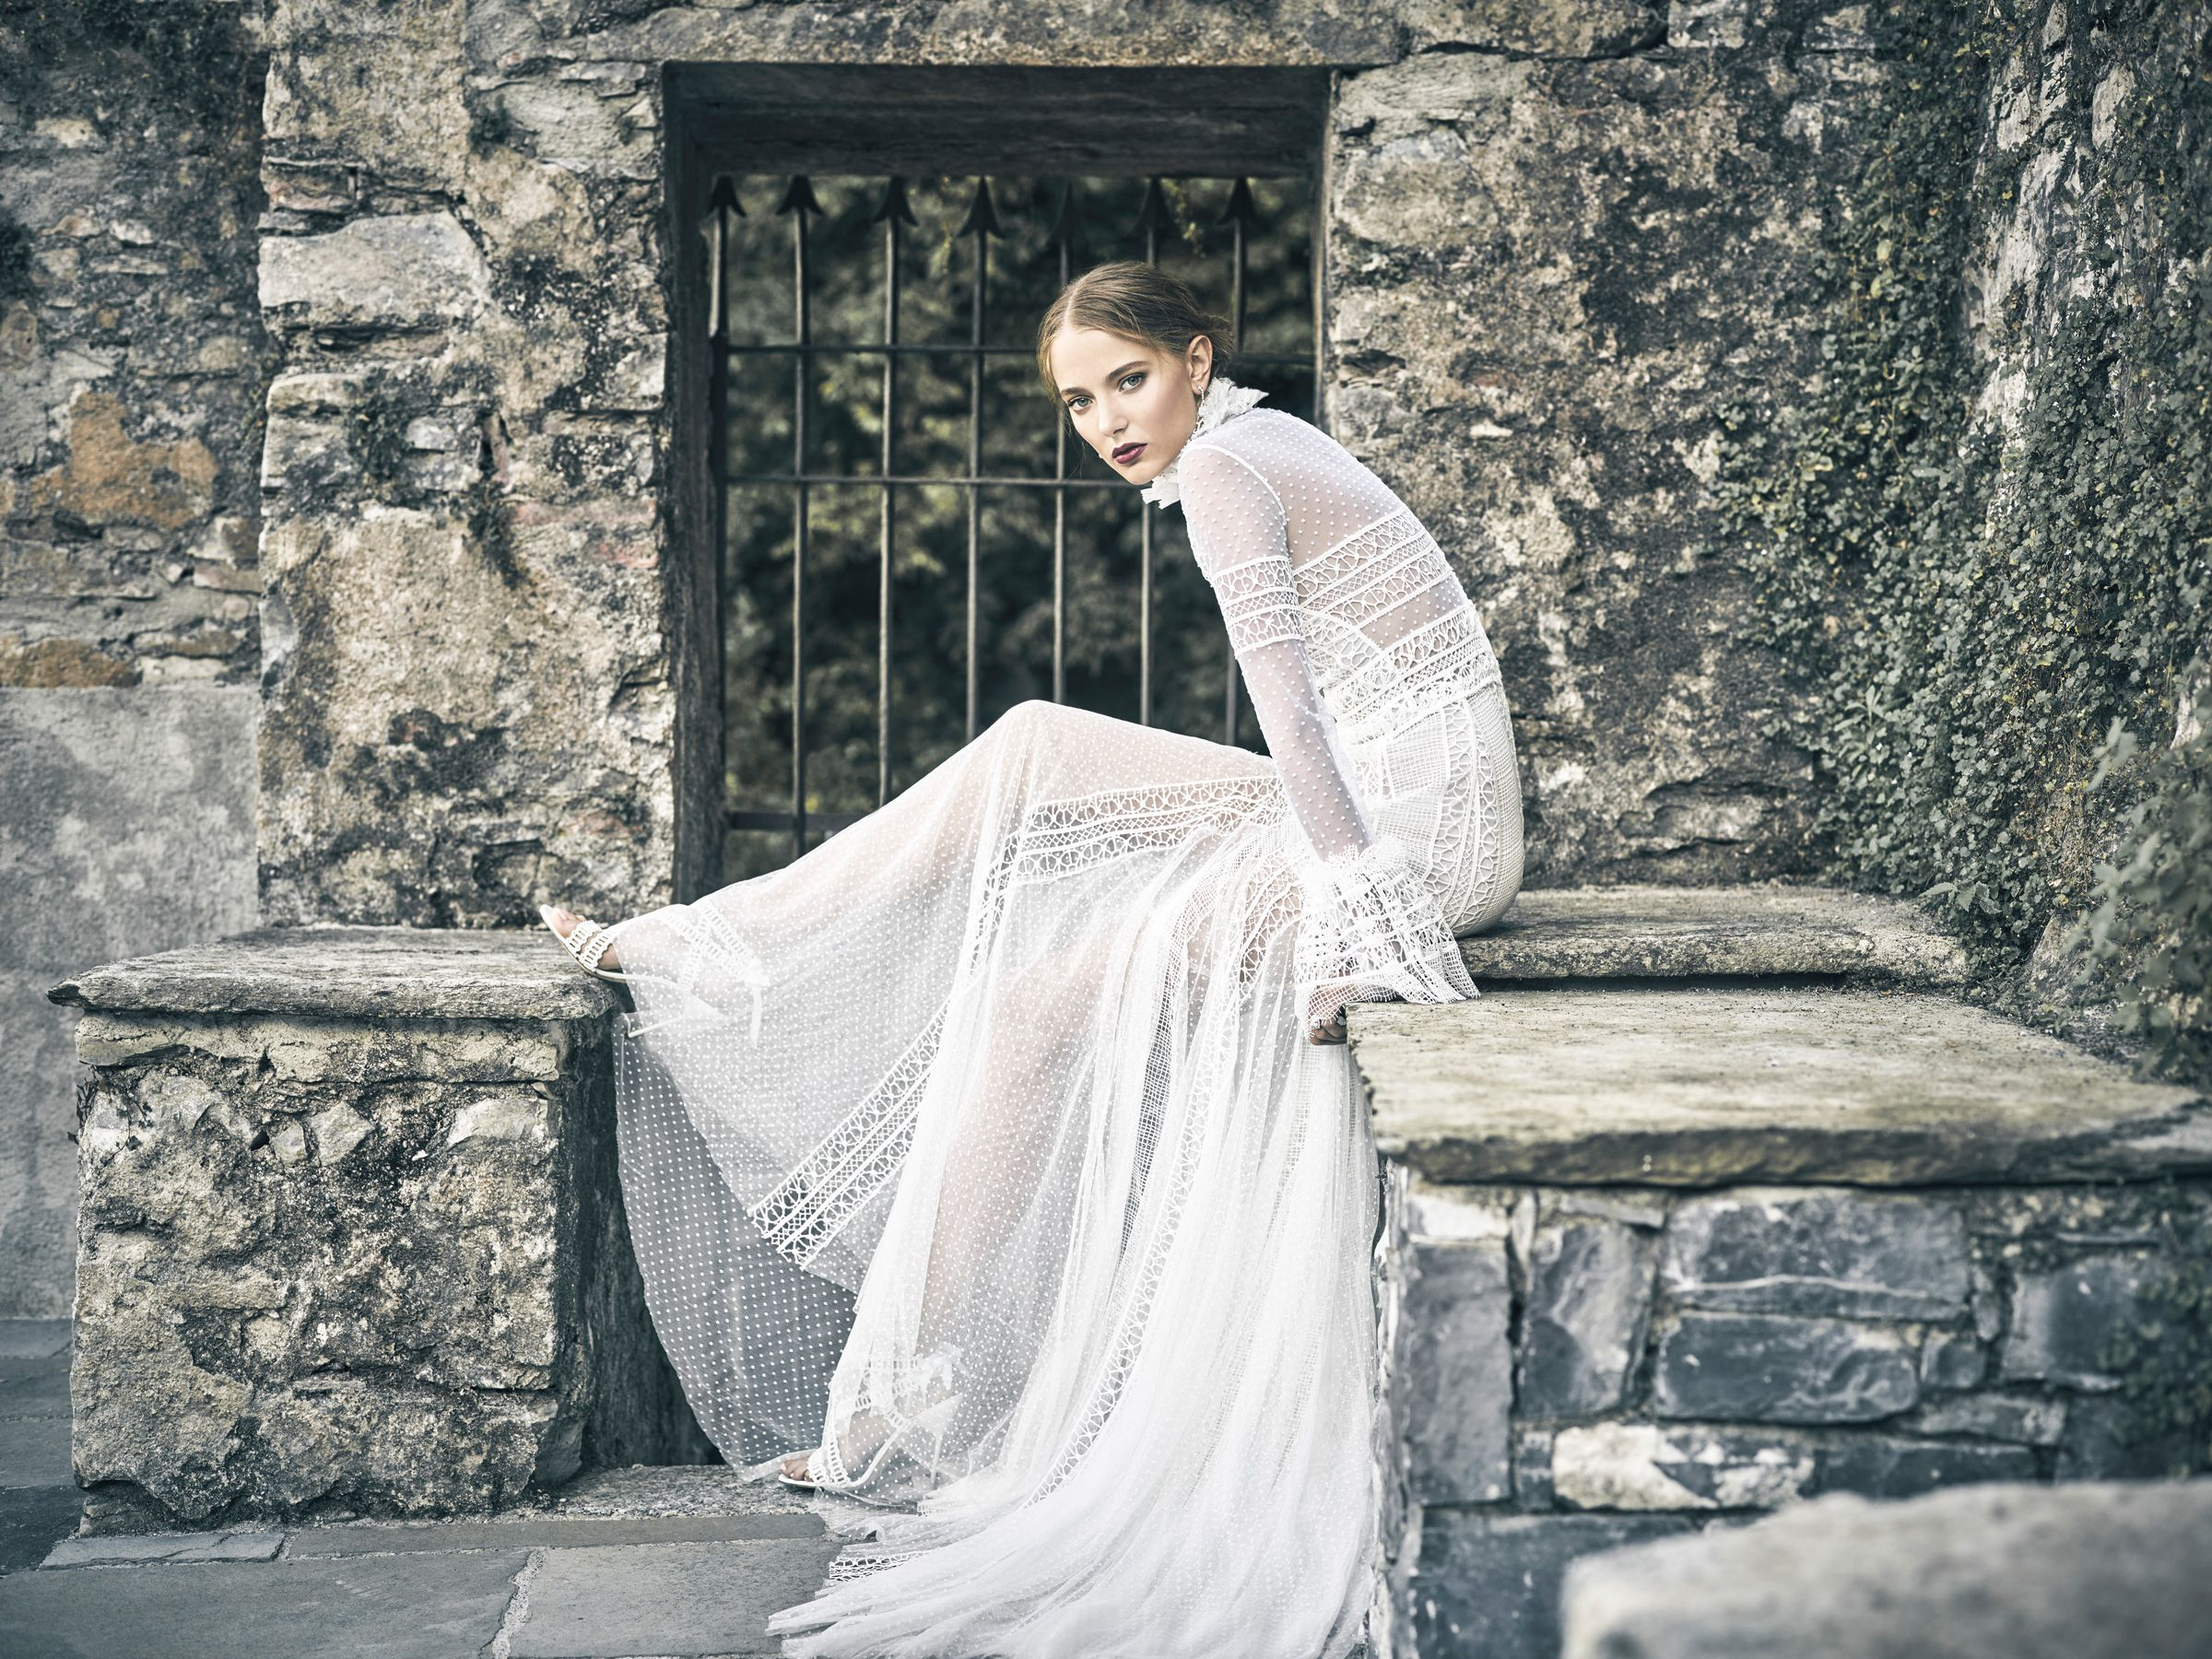 70 Best Bohemian Wedding Dresses Boho Wedding Dress Ideas For Hippie Brides,Wedding Flower Girl Dresses Red